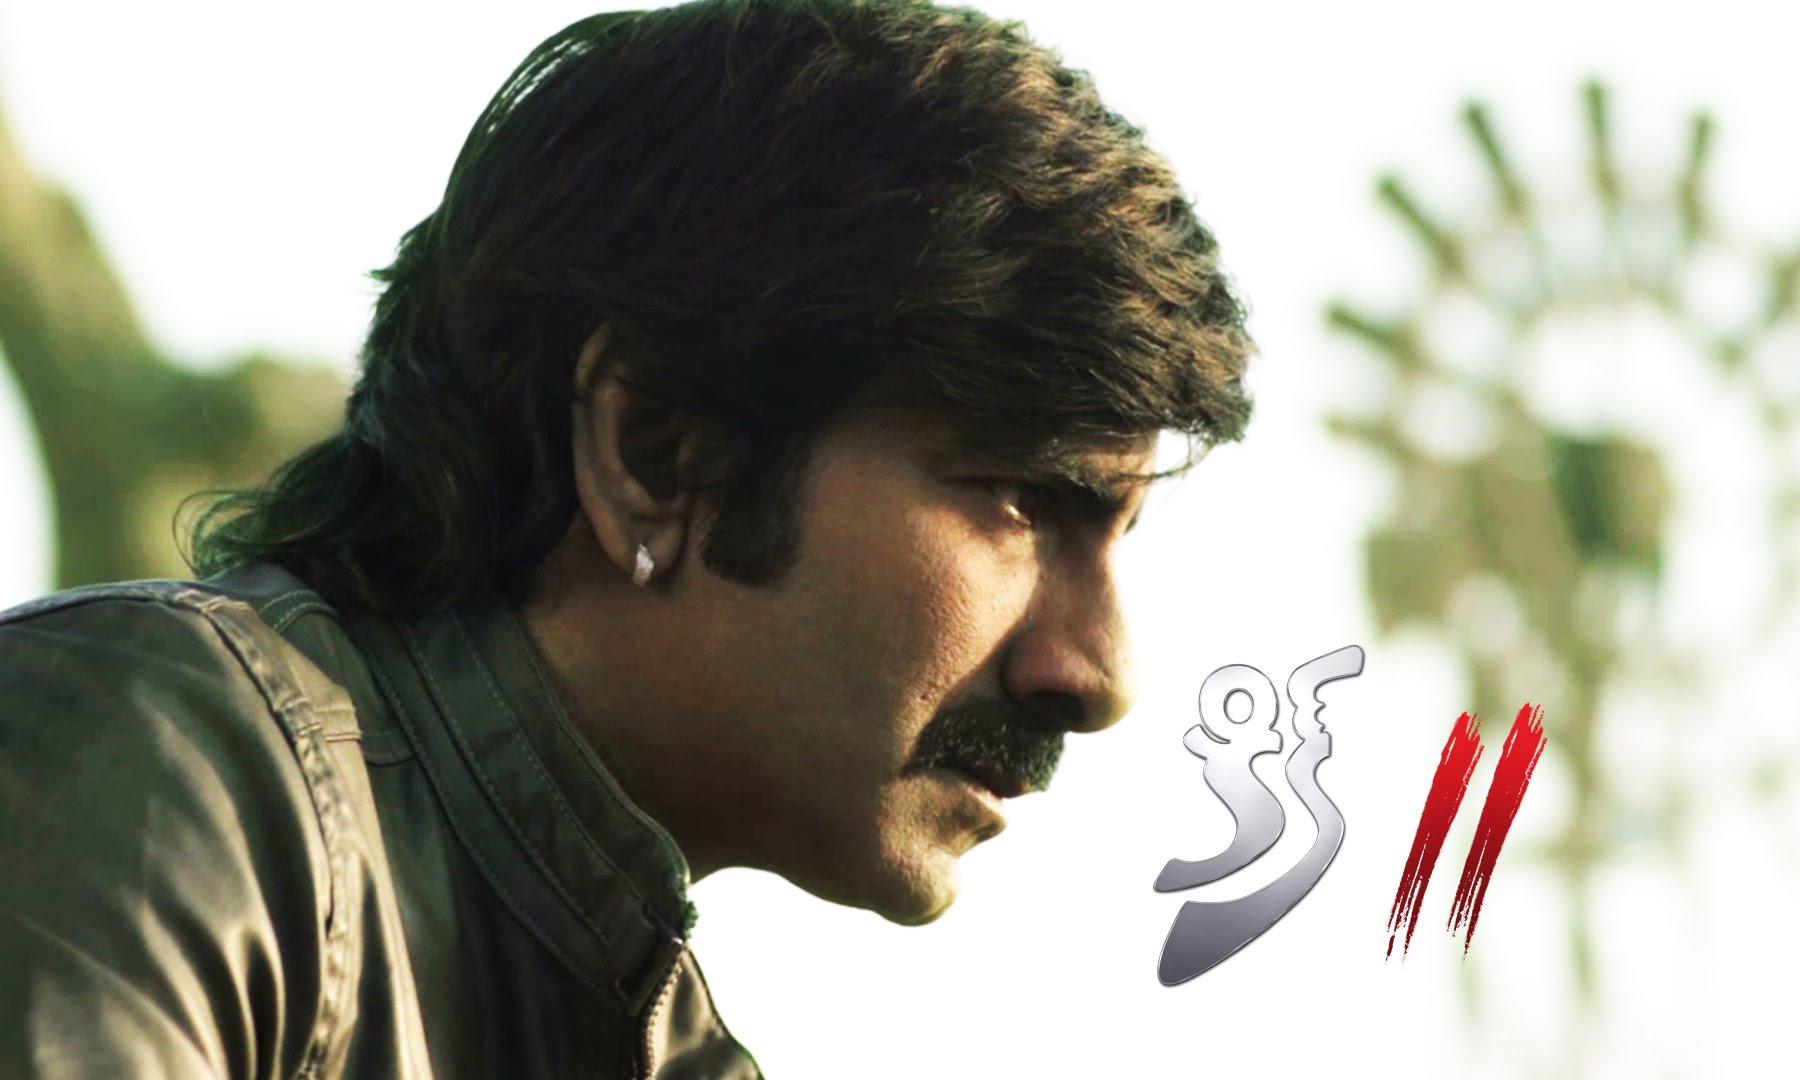 Kick 2 (Telugu) Movie Details: Ft. Ravi Teja & Rakul Preet Singh, Releasing on 21st August